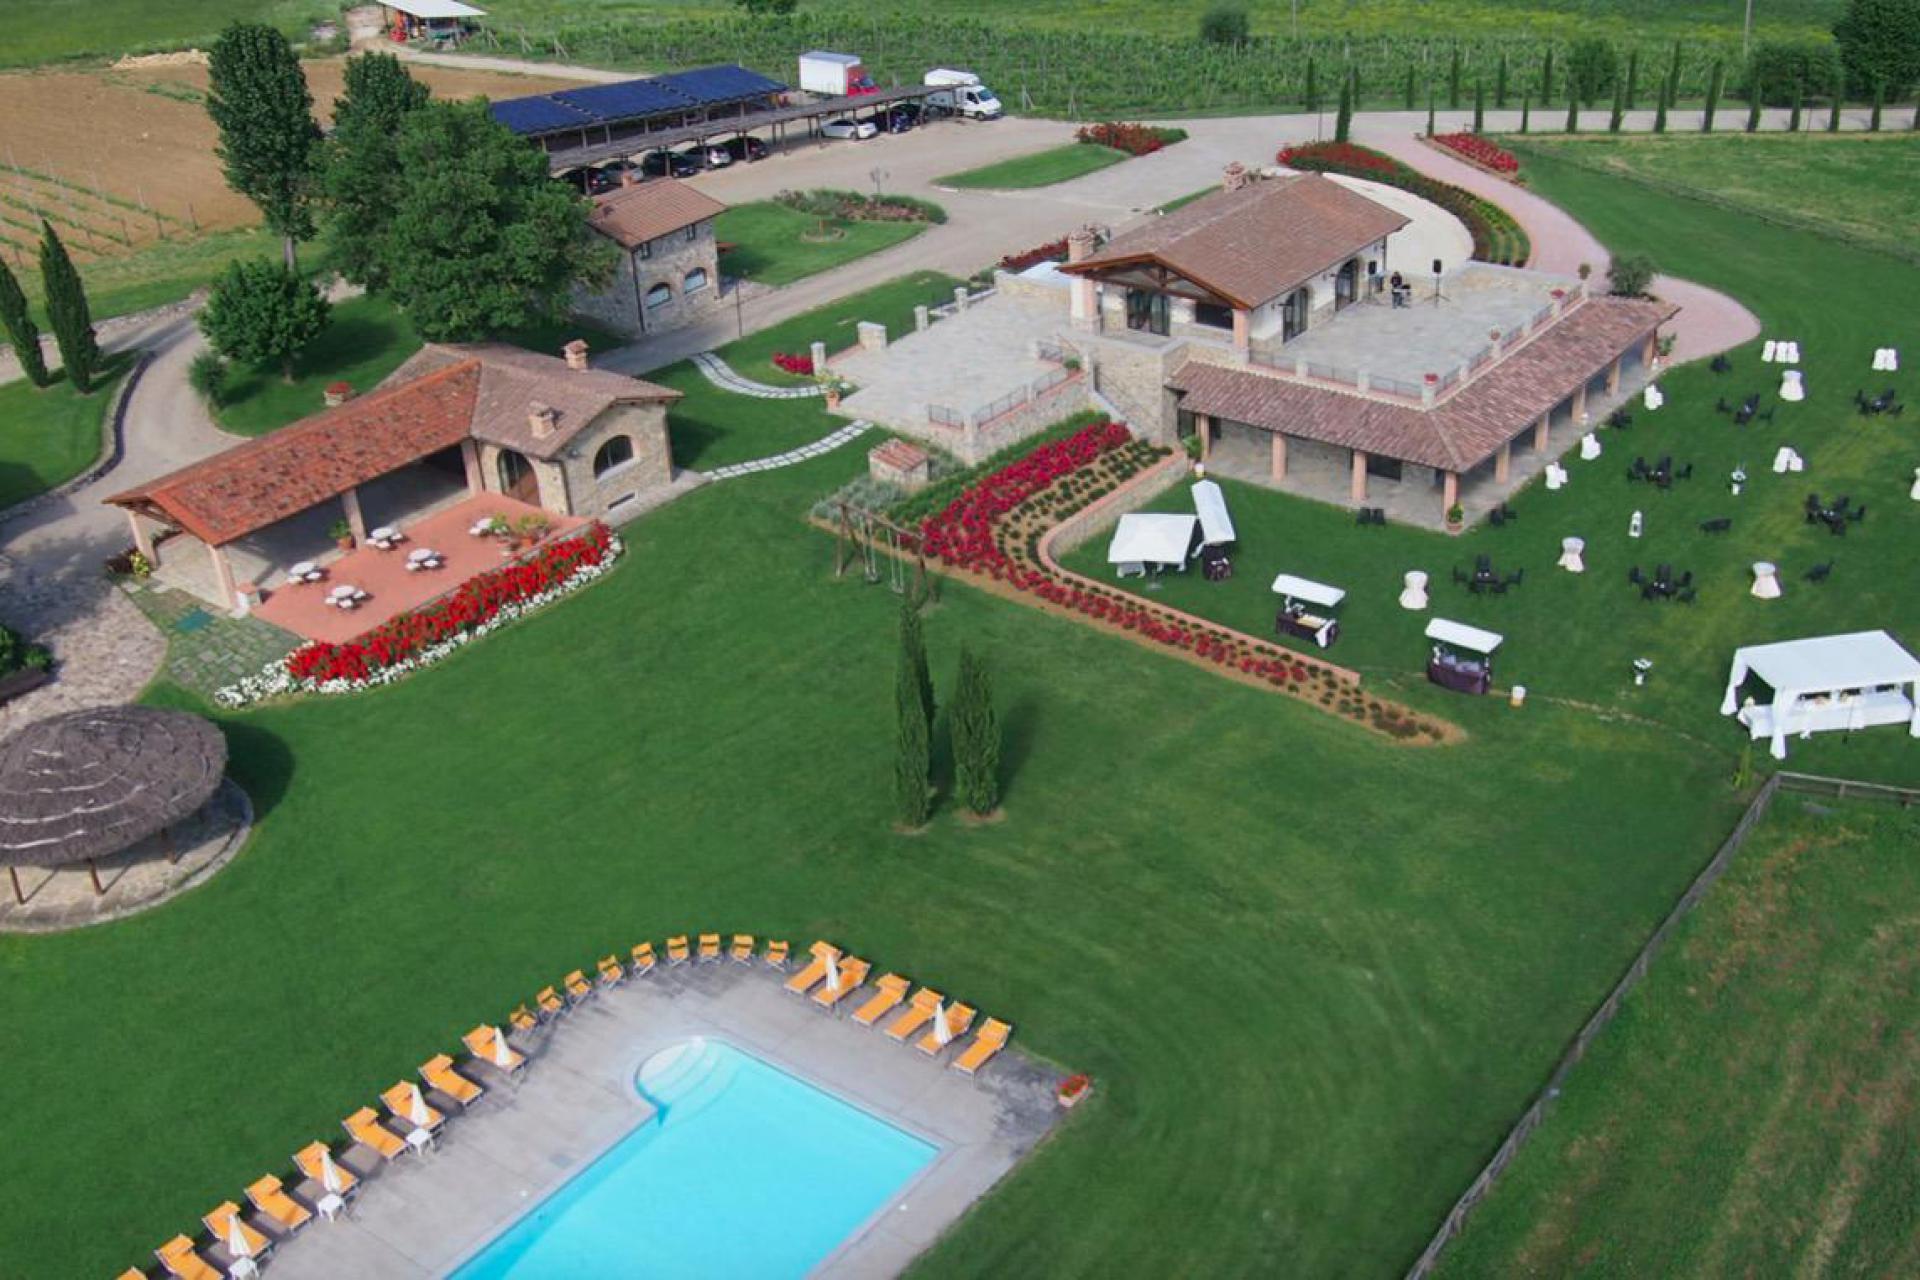 Agriturismo Tuscany Beautiful Agriturismo - Farmhouse in Tuscany with amazing view!